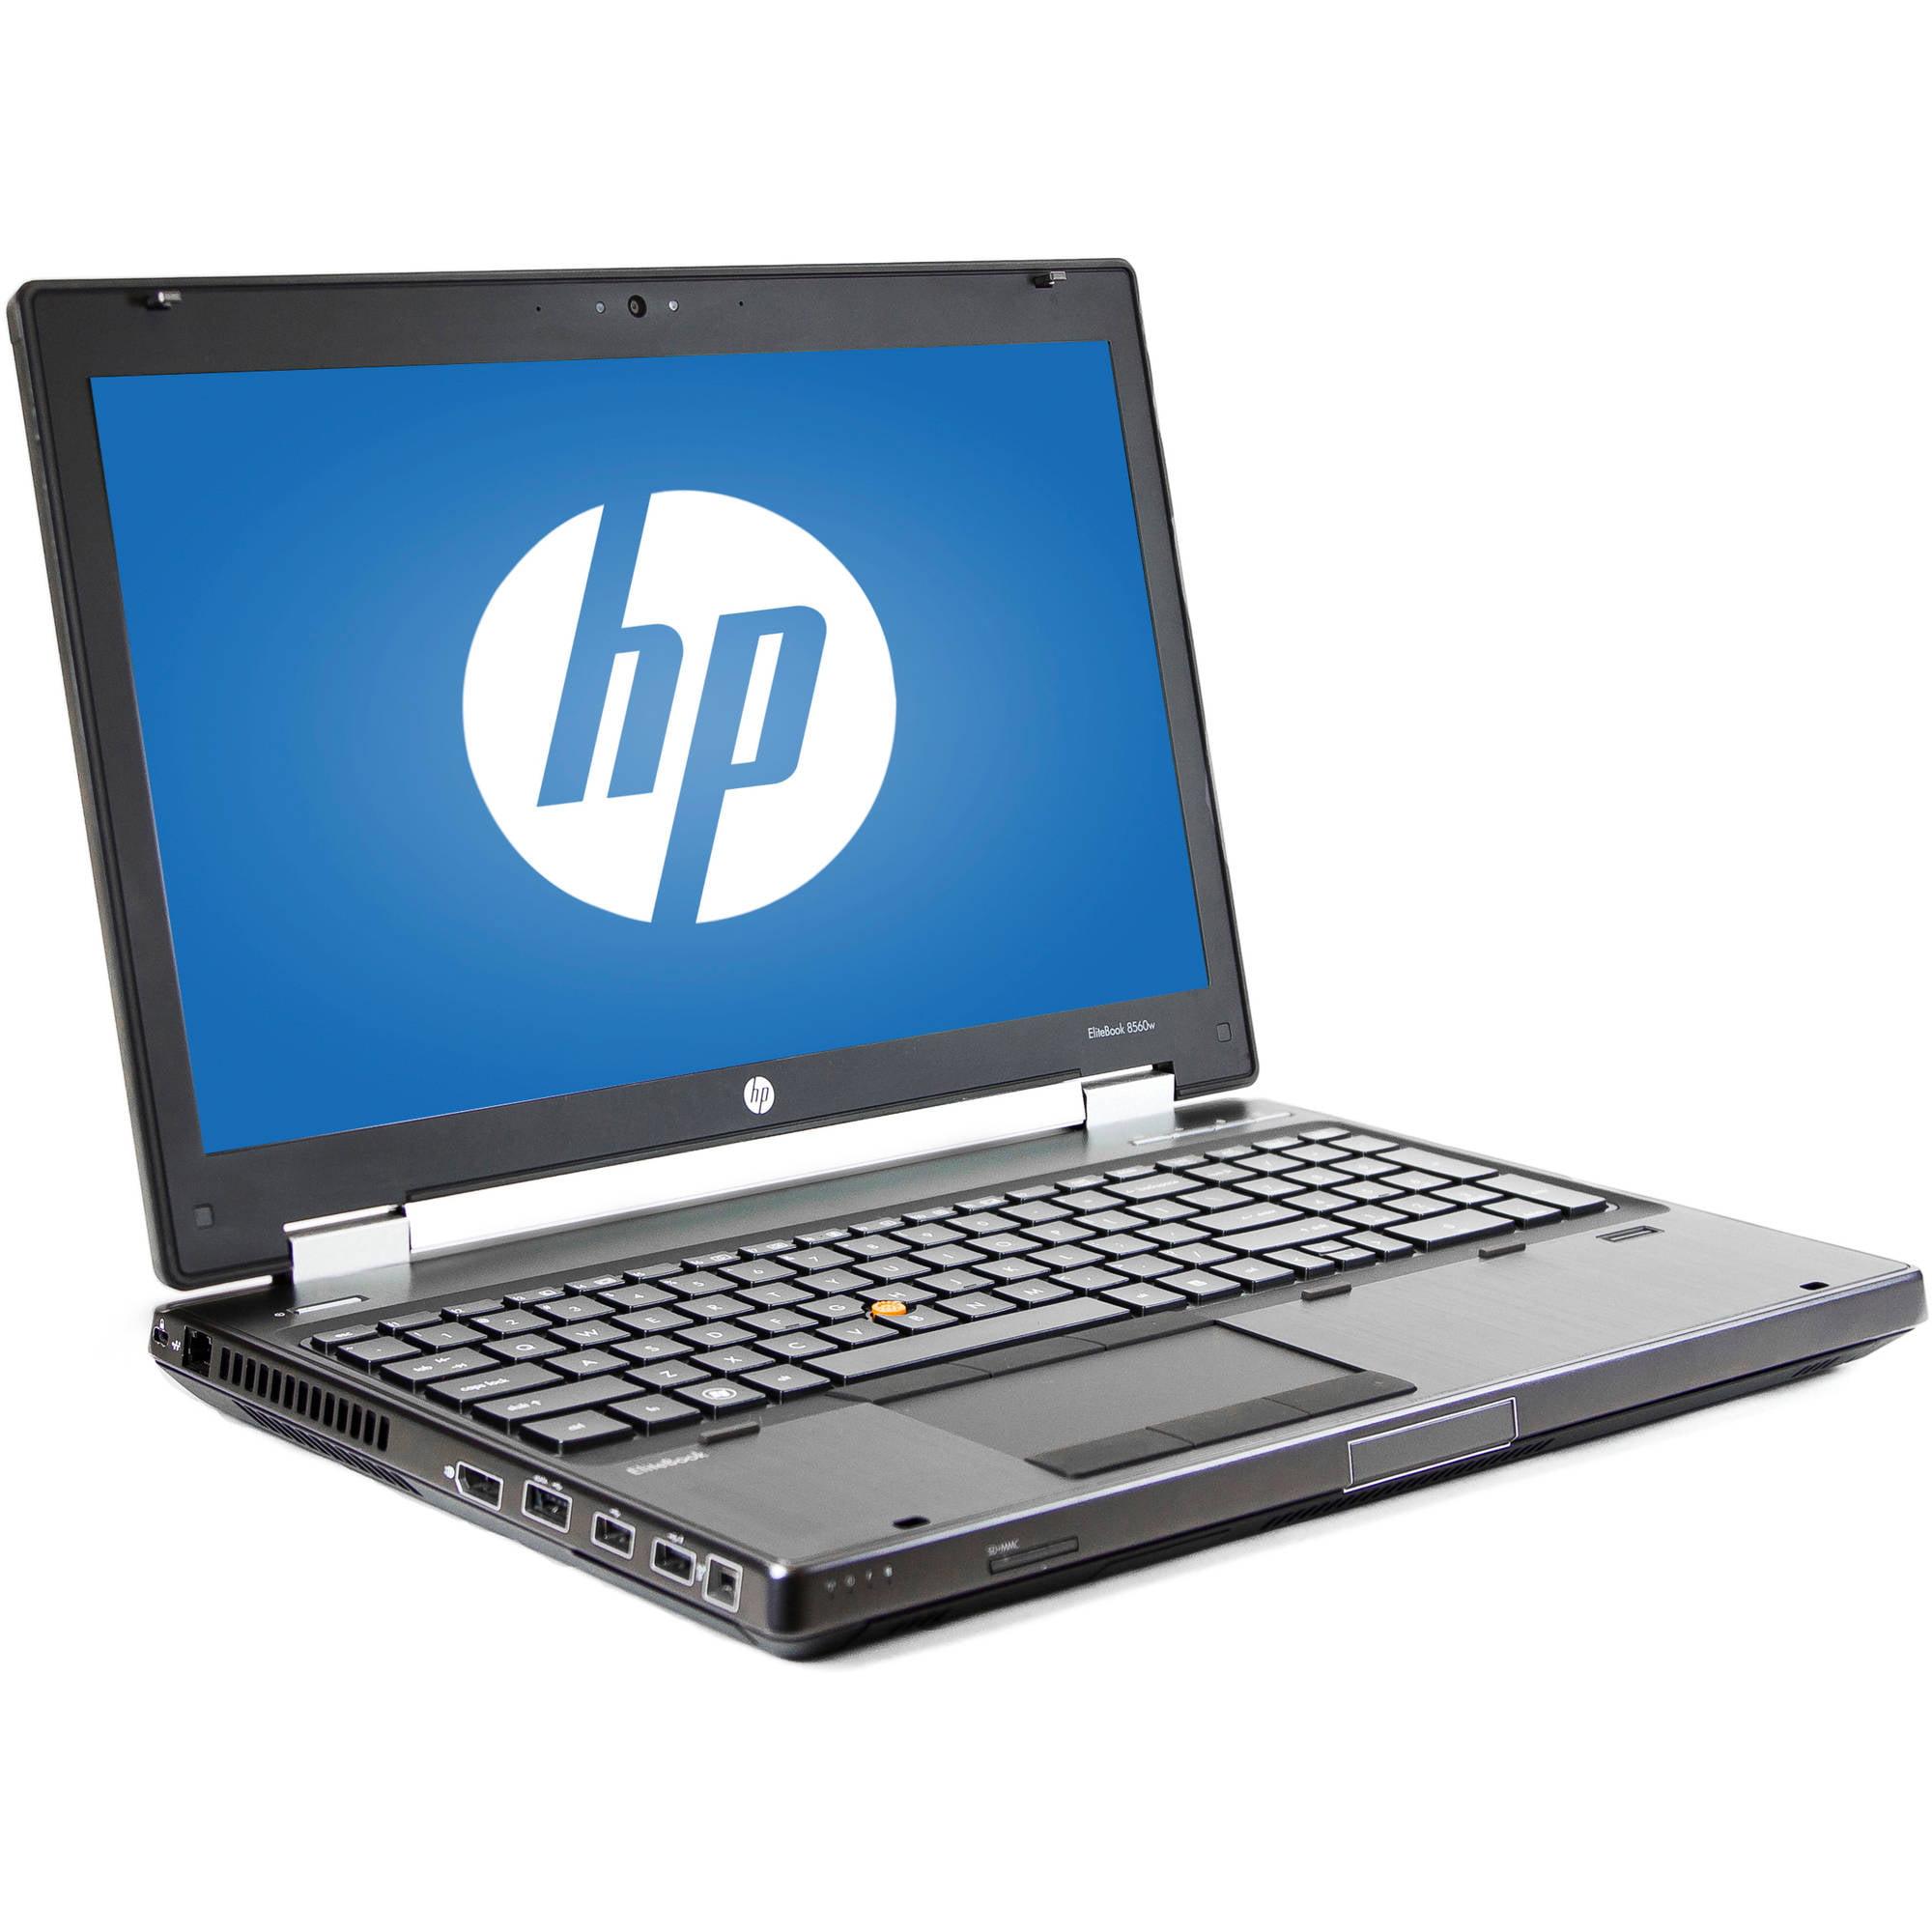 "Refurbished HP Silver 15.6"" 8560W Elitebook Laptop PC with Intel Core i7-2820QM Processor, 8GB Memory, 500GB Hard Drive and Windows 7 Professional"